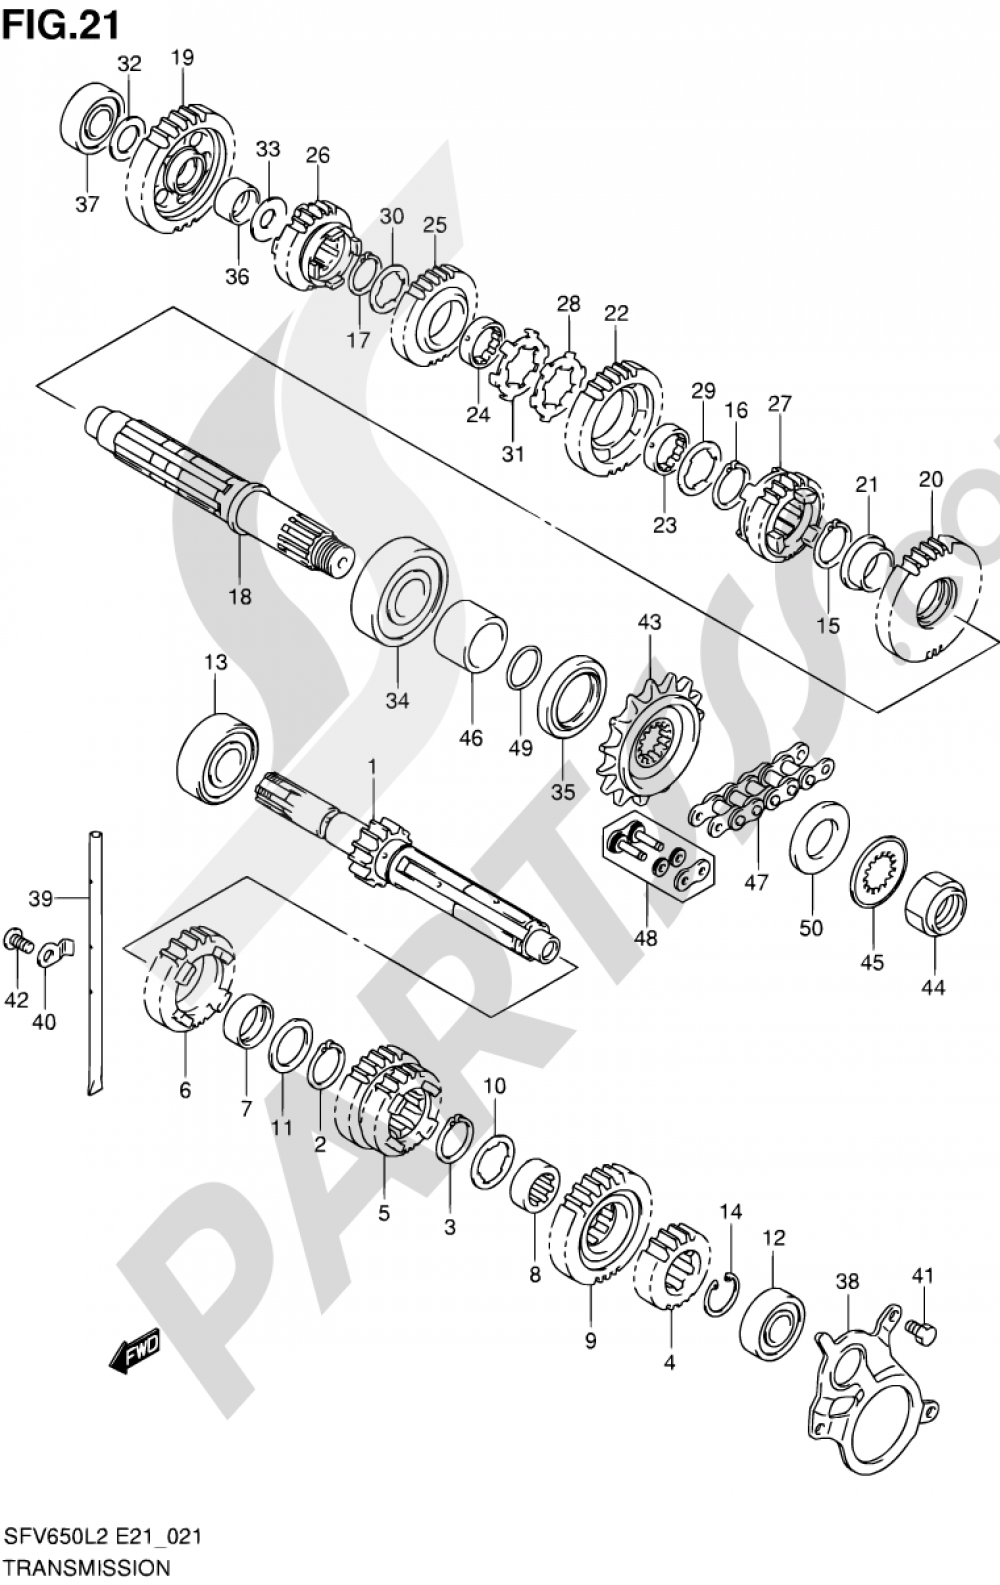 21 - TRANSMISSION Suzuki GLADIUS SFV650 2012